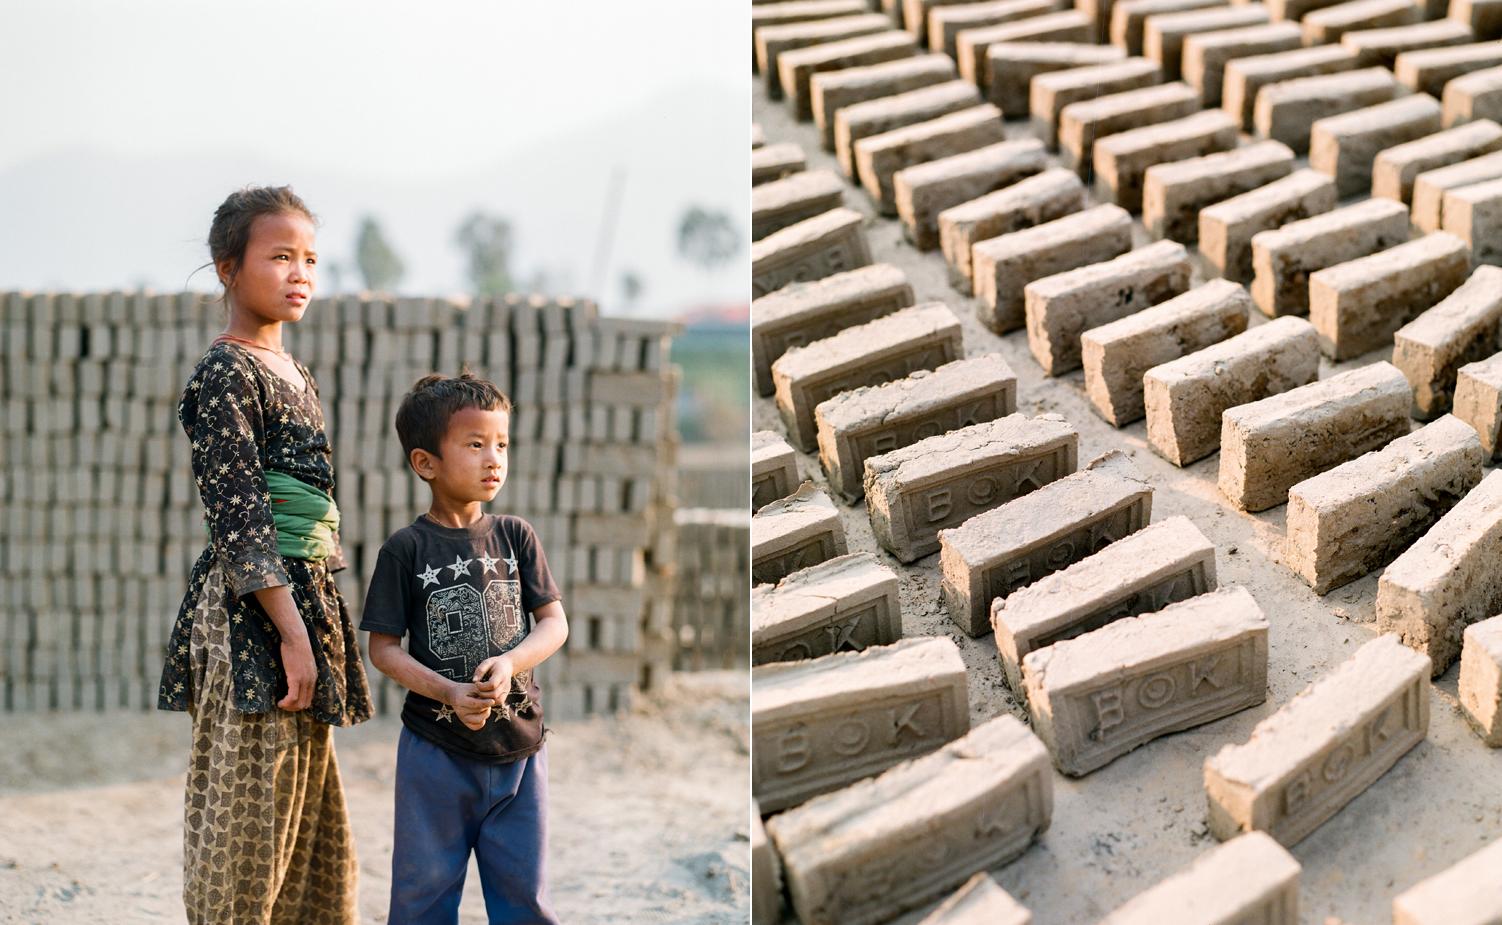 webakp-nepal-1040.jpg